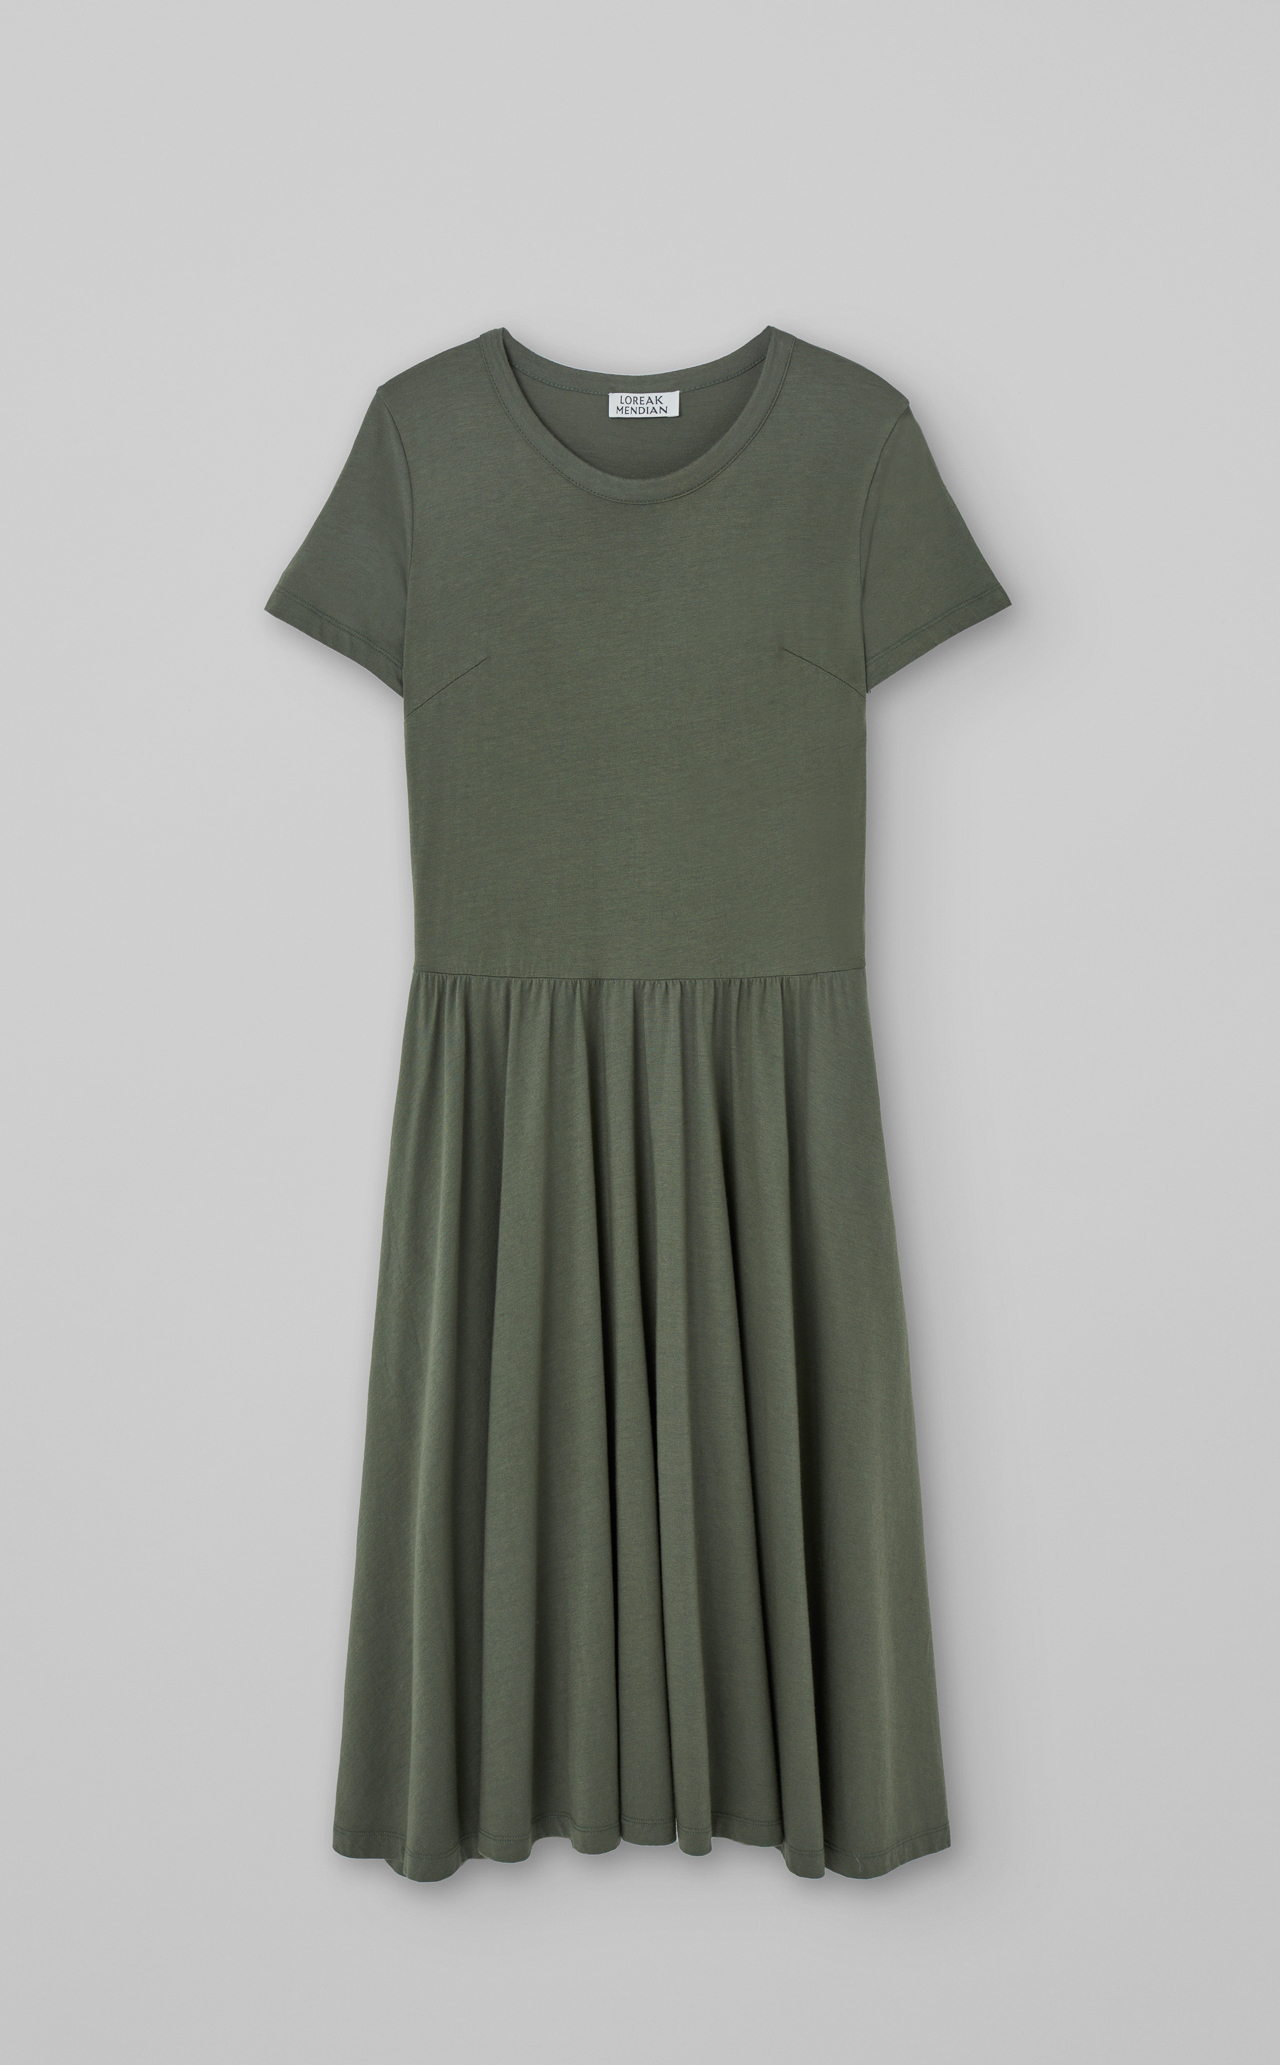 Paige Lm Dress